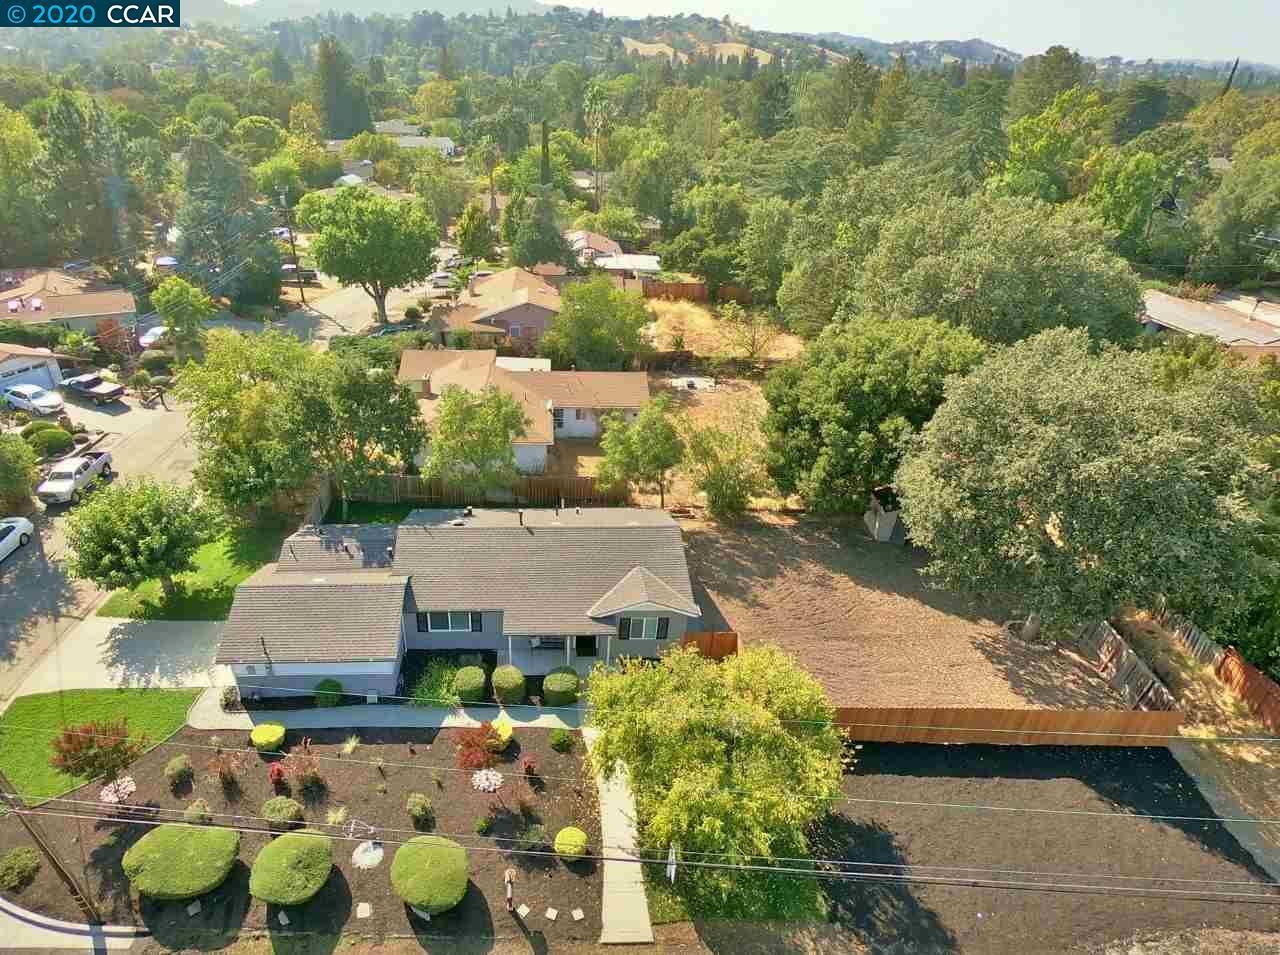 Photo of 263 Oakvue Rd, PLEASANT HILL, CA 94523 (MLS # 40921249)